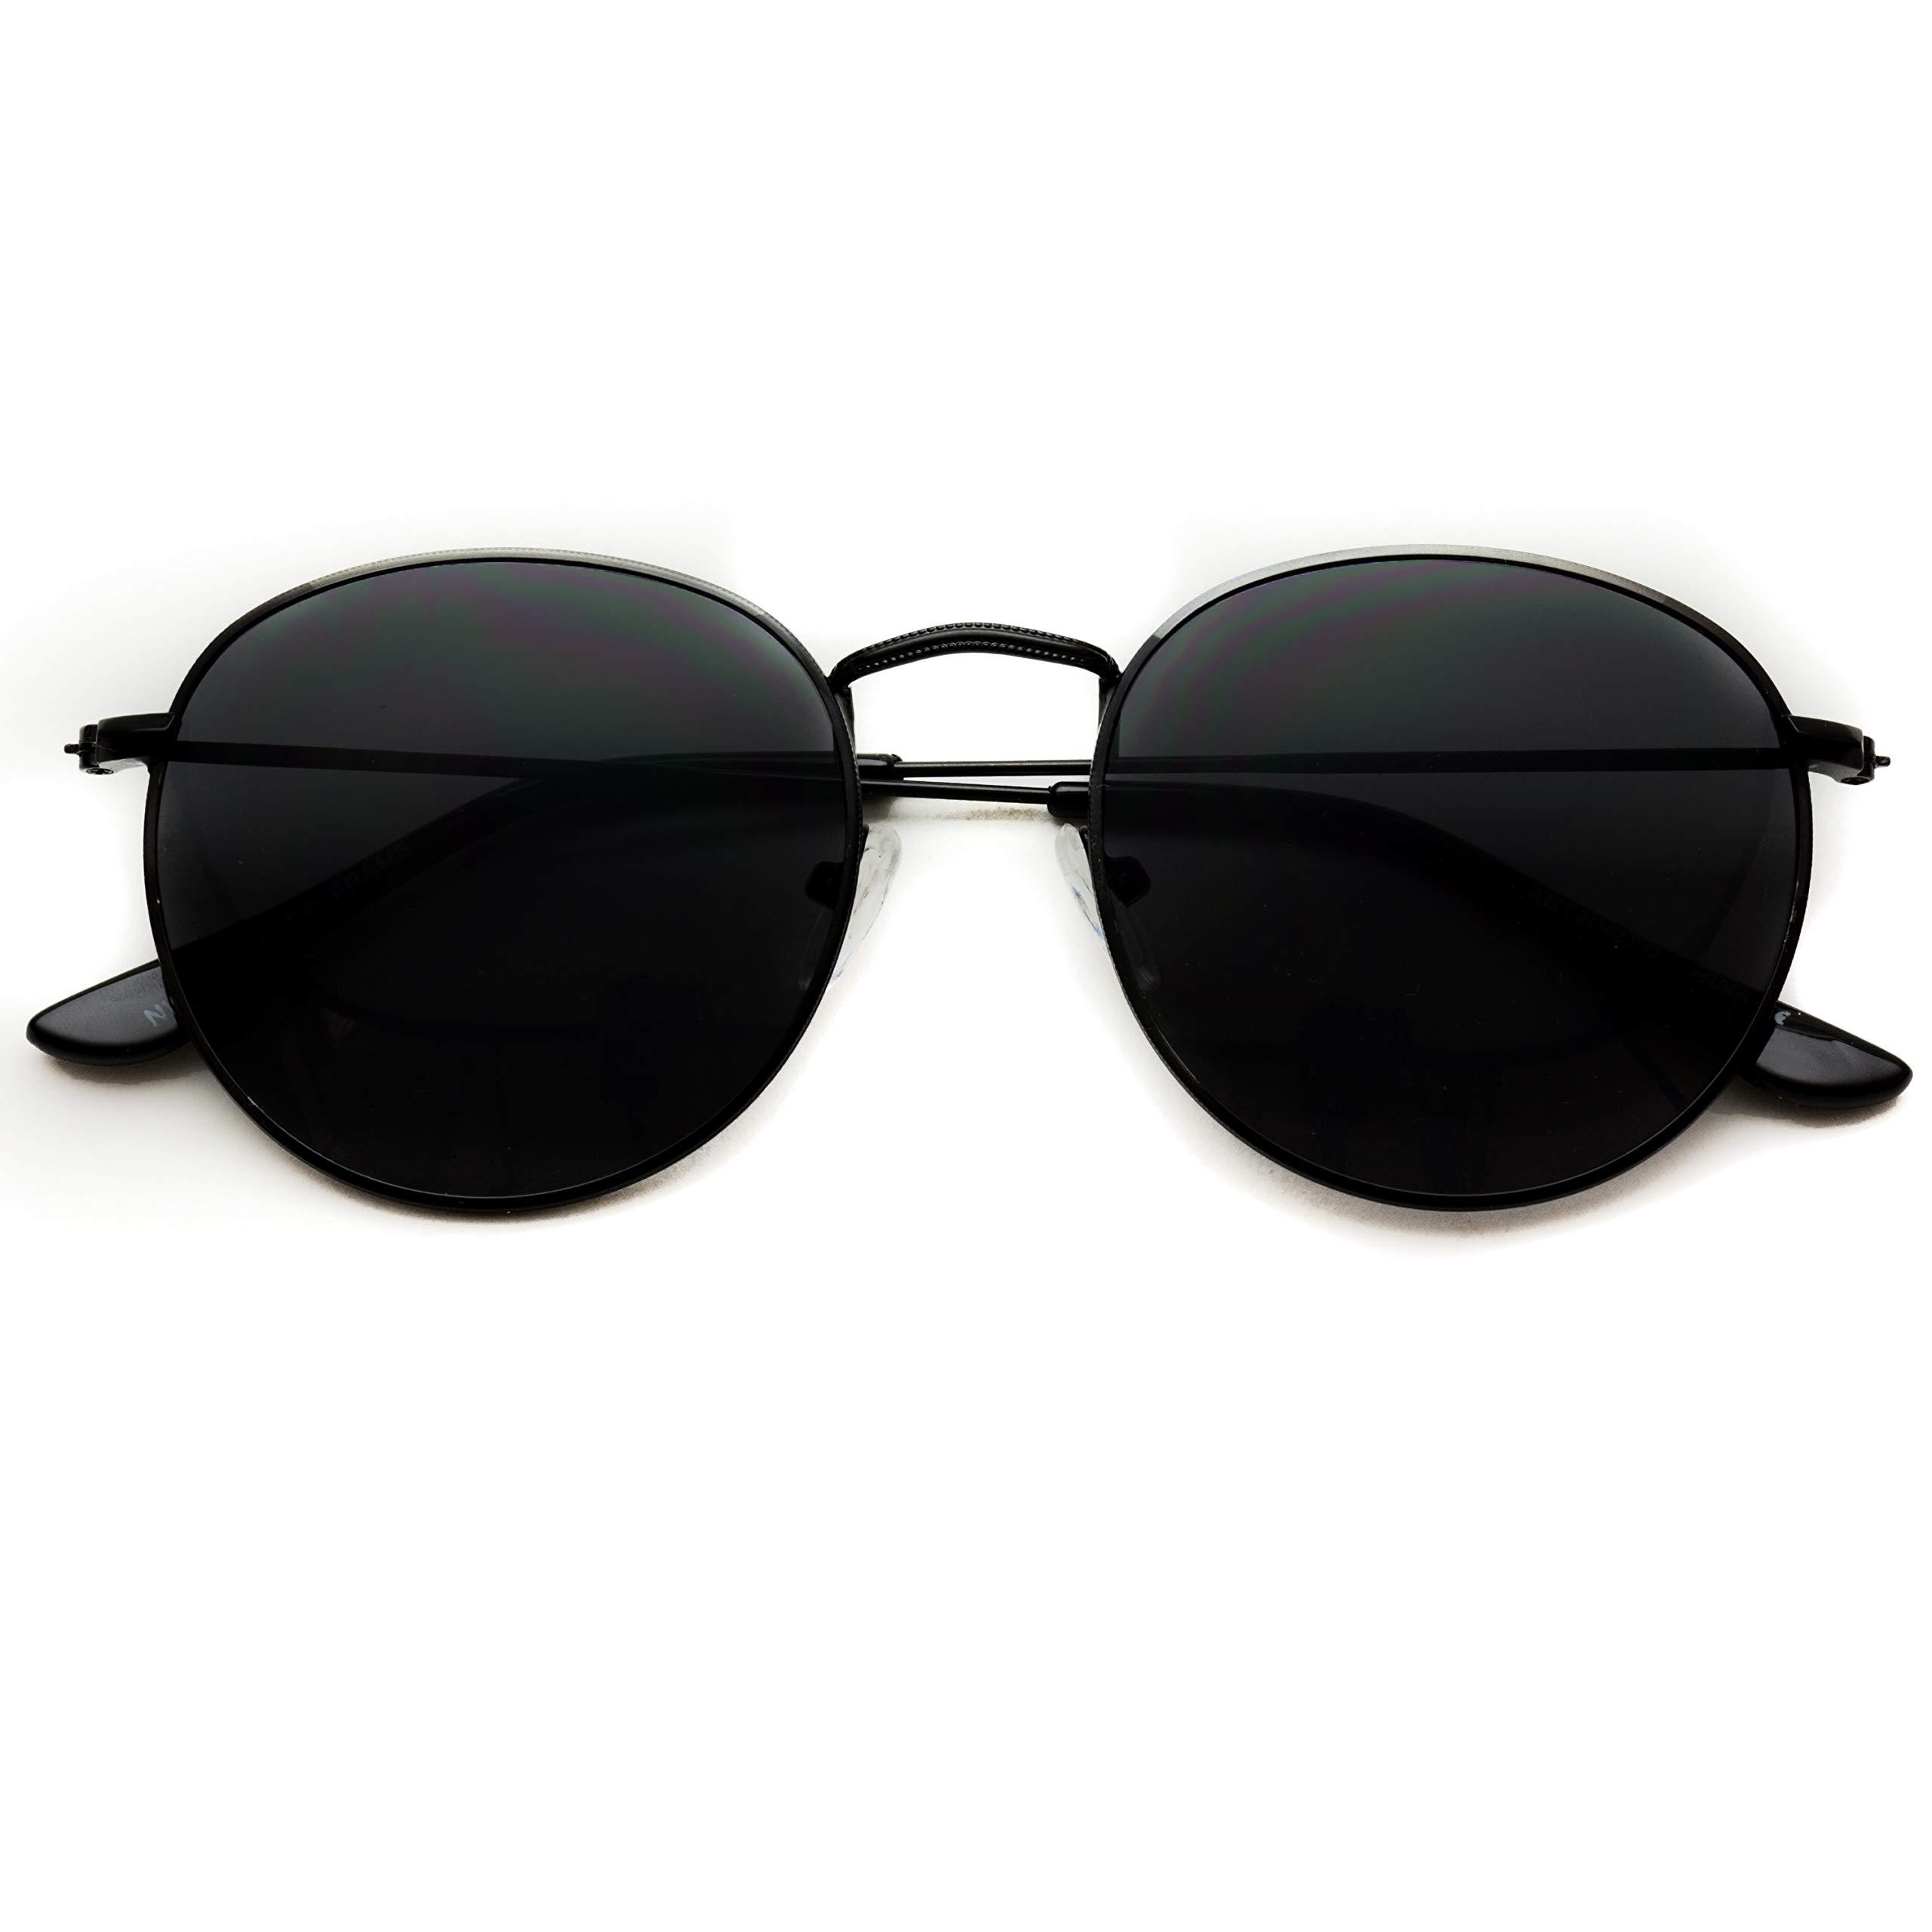 WearMe Pro - Reflective Lens Round Trendy Sunglasses (Black Frame/Black Lens, 51)